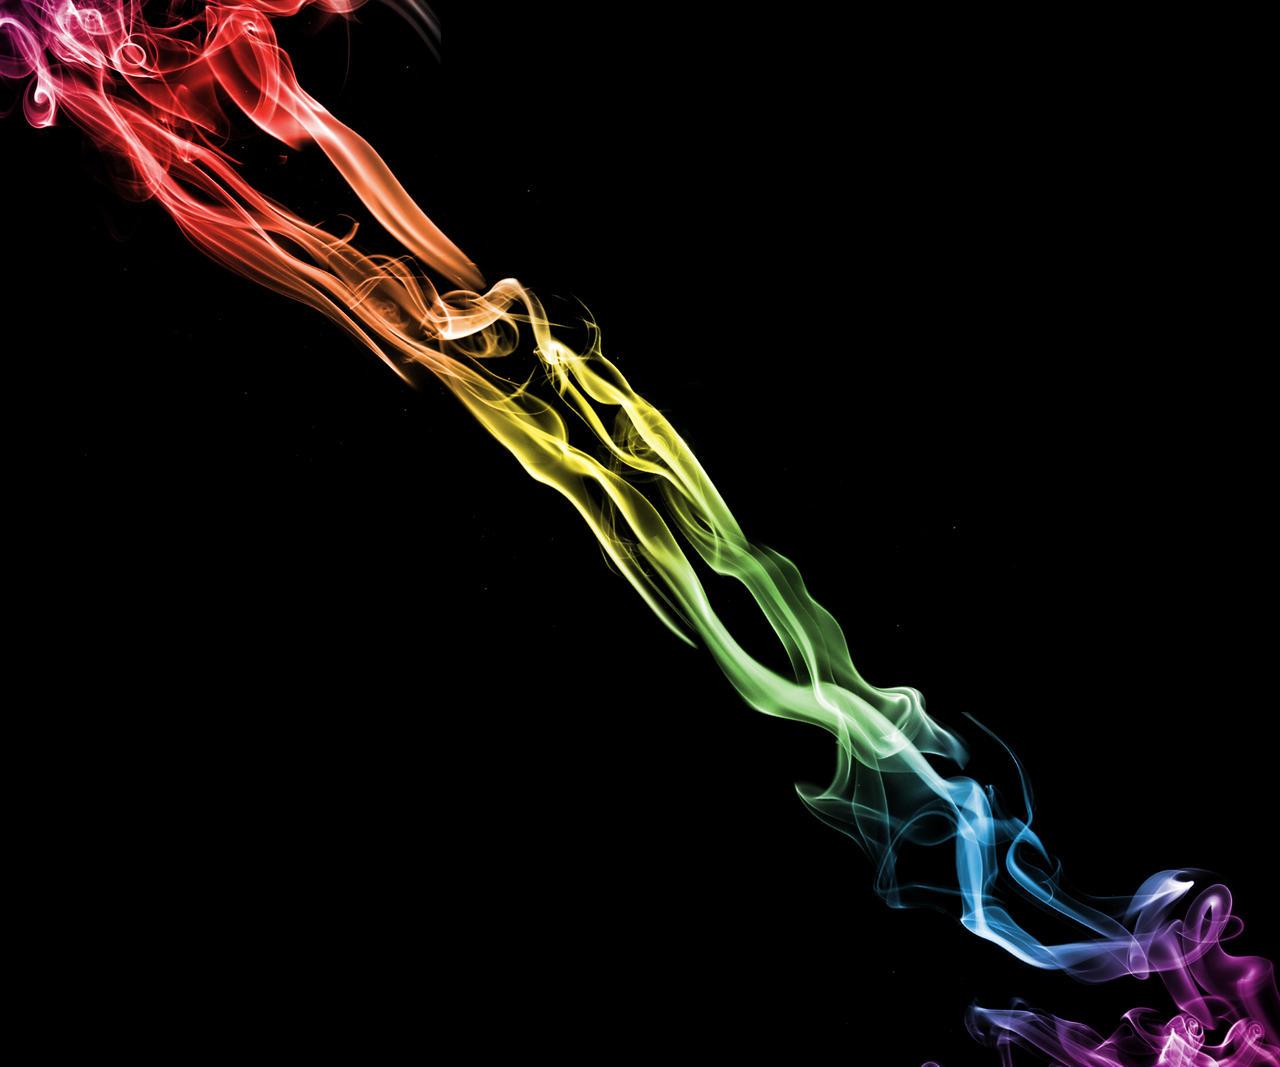 Rainbow Wallpaper By Archangel4434 On DeviantArt